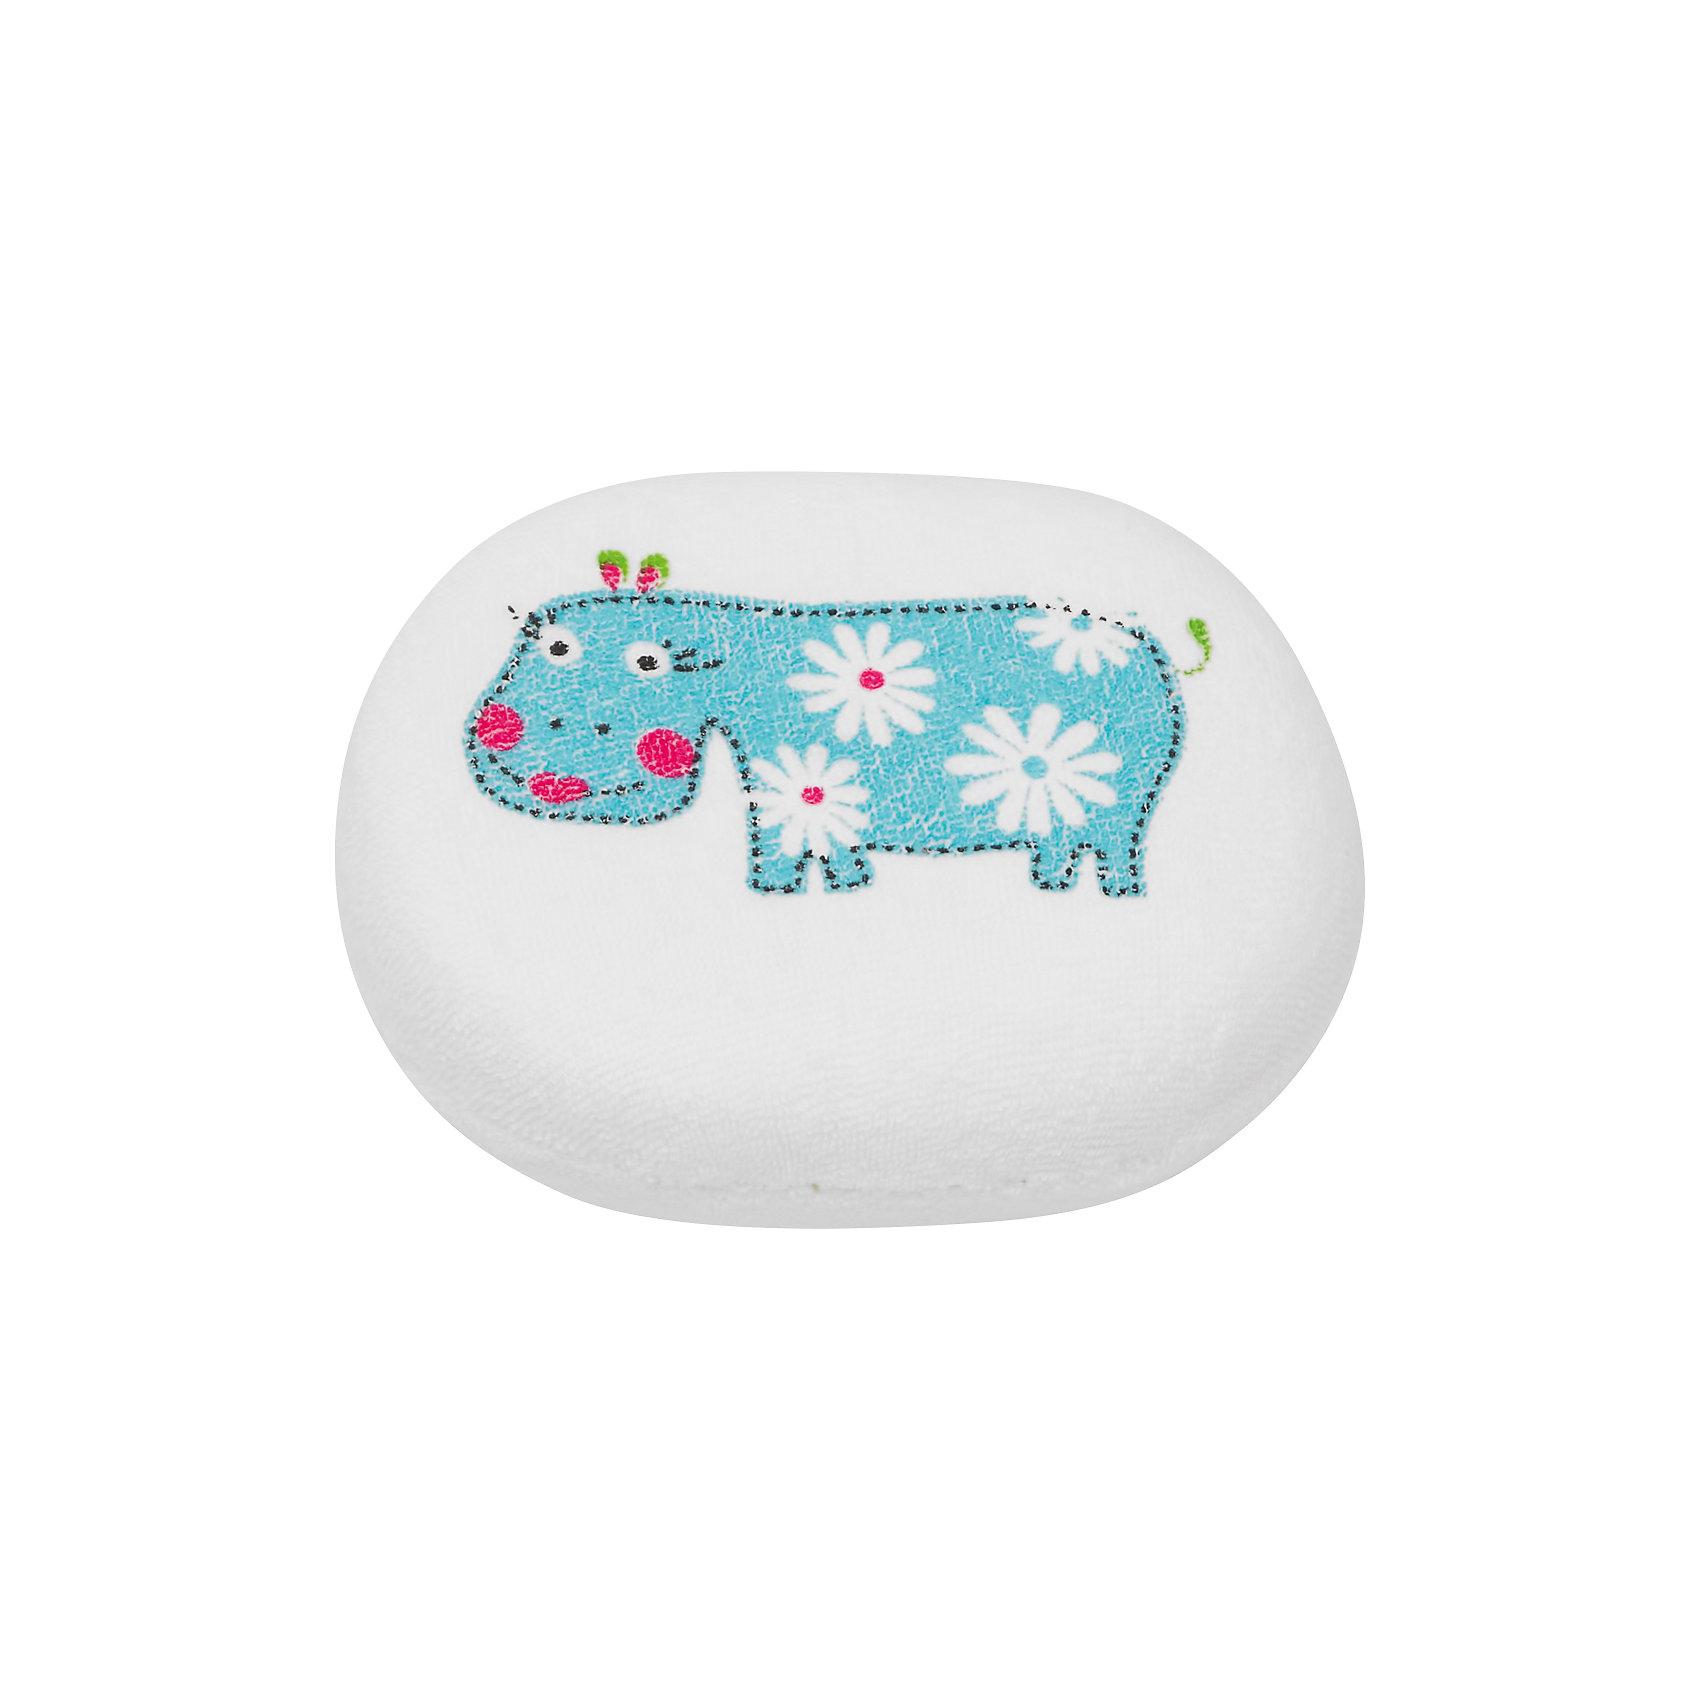 Roxy-Kids Мягкая губка с хлопковым покрытием, Roxy-kids roxy kids круг для купания kengu